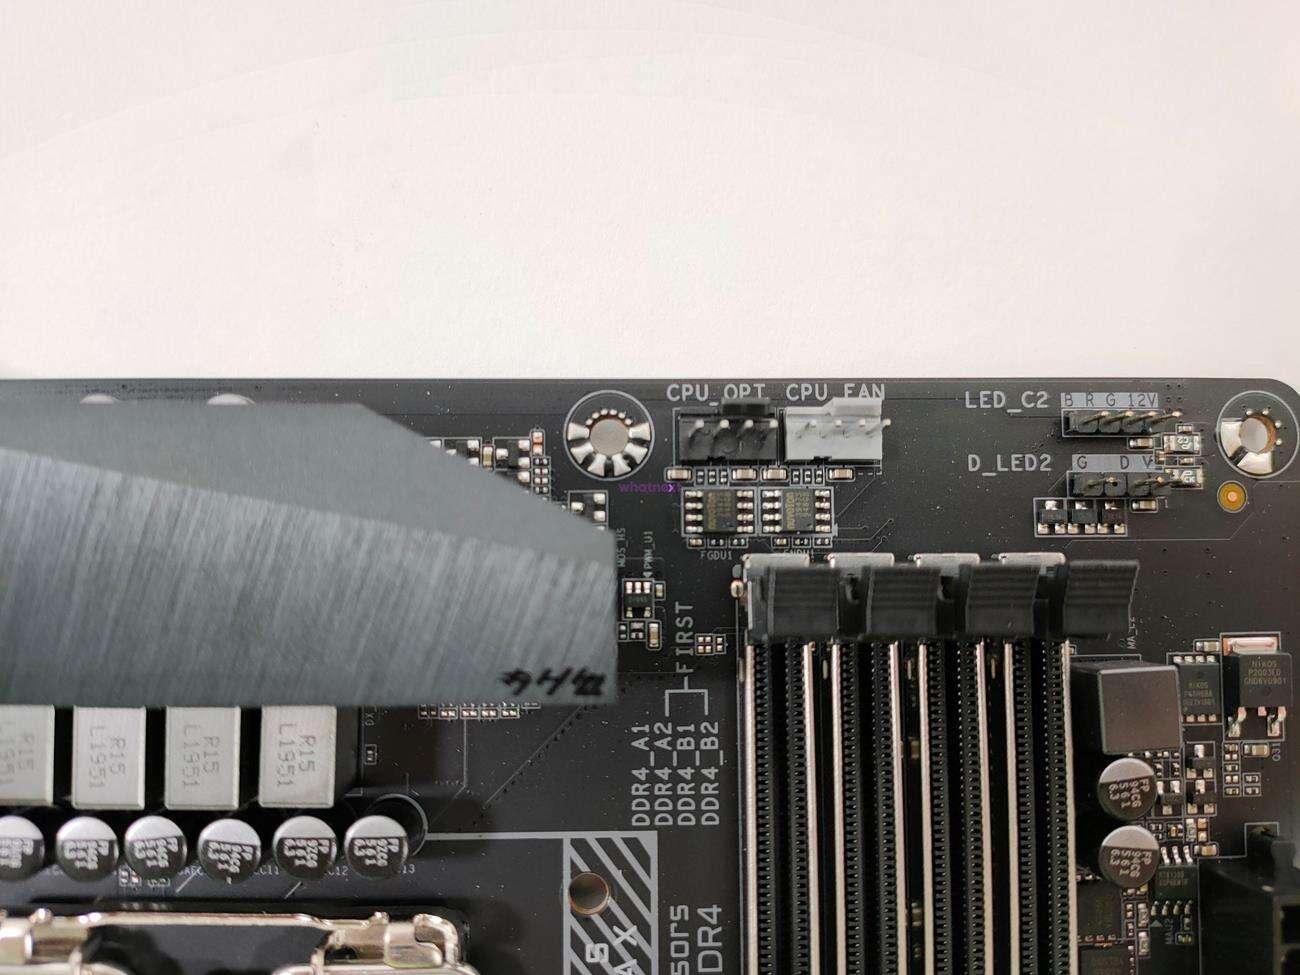 test Z490 Aorus Pro AX, recenzja Z490 Aorus Pro AX, review Z490 Aorus Pro AX, opinia Z490 Aorus Pro AX, cena Z490 Aorus Pro AX